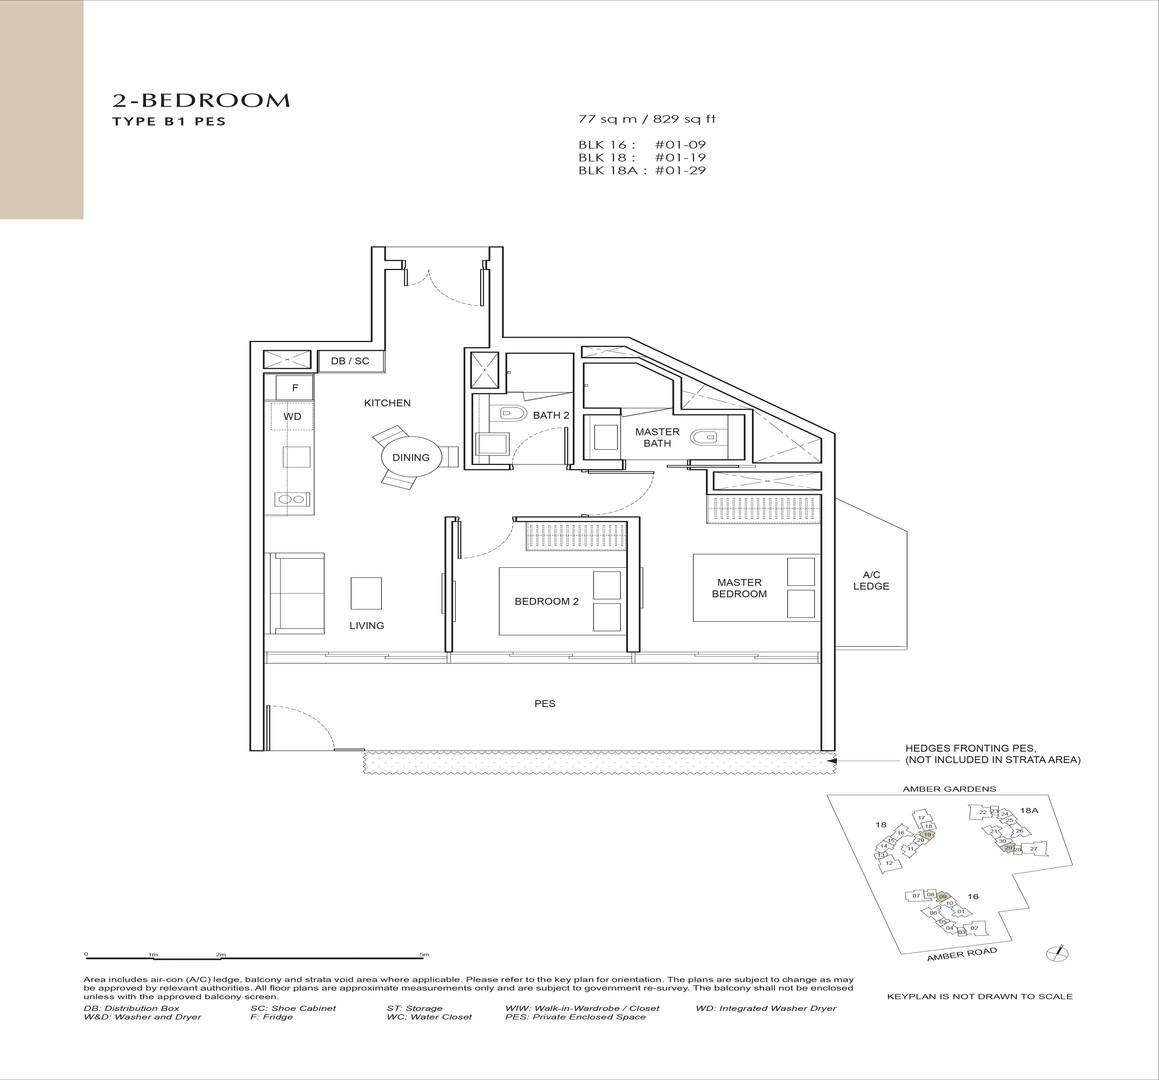 2_Bedroom_TypeB1PES.jpg